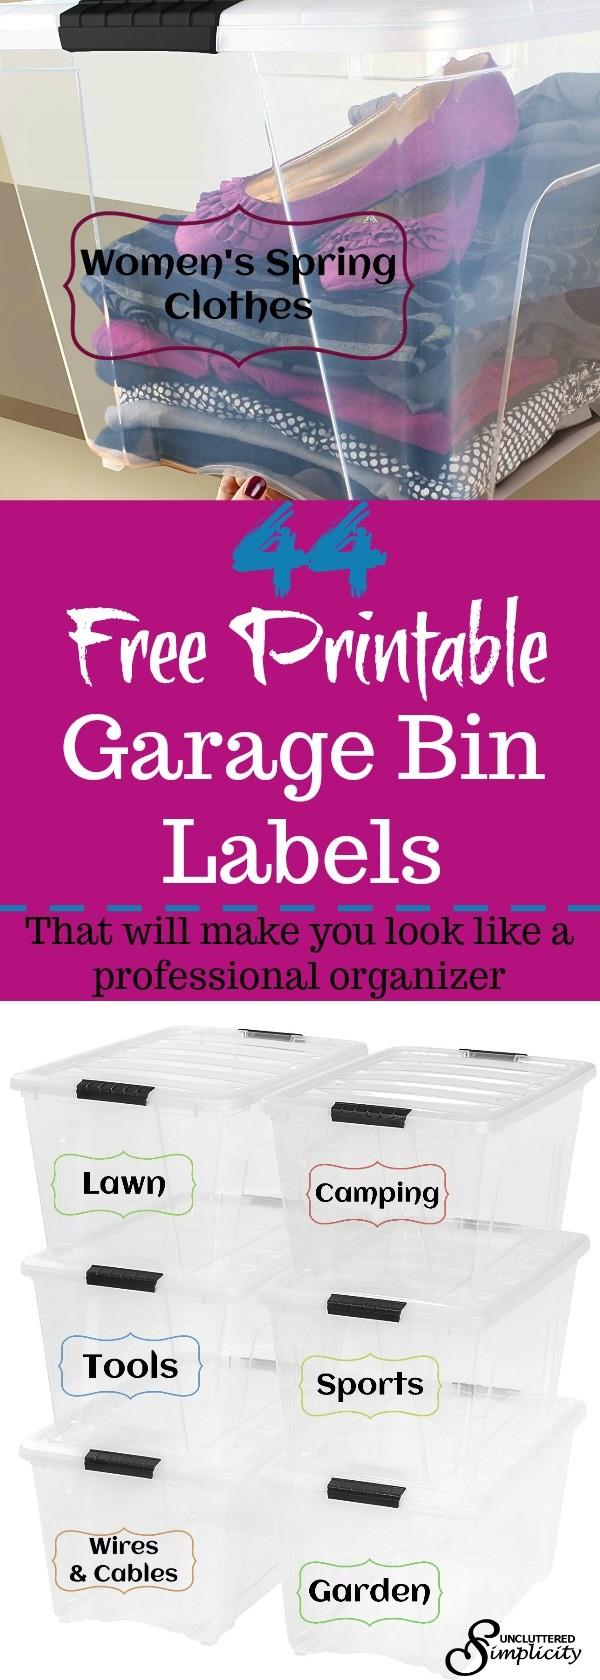 free printable garage bin labels | garage organization printables | free printables to organize your garage, attic, basement and more #organize #printables #labels